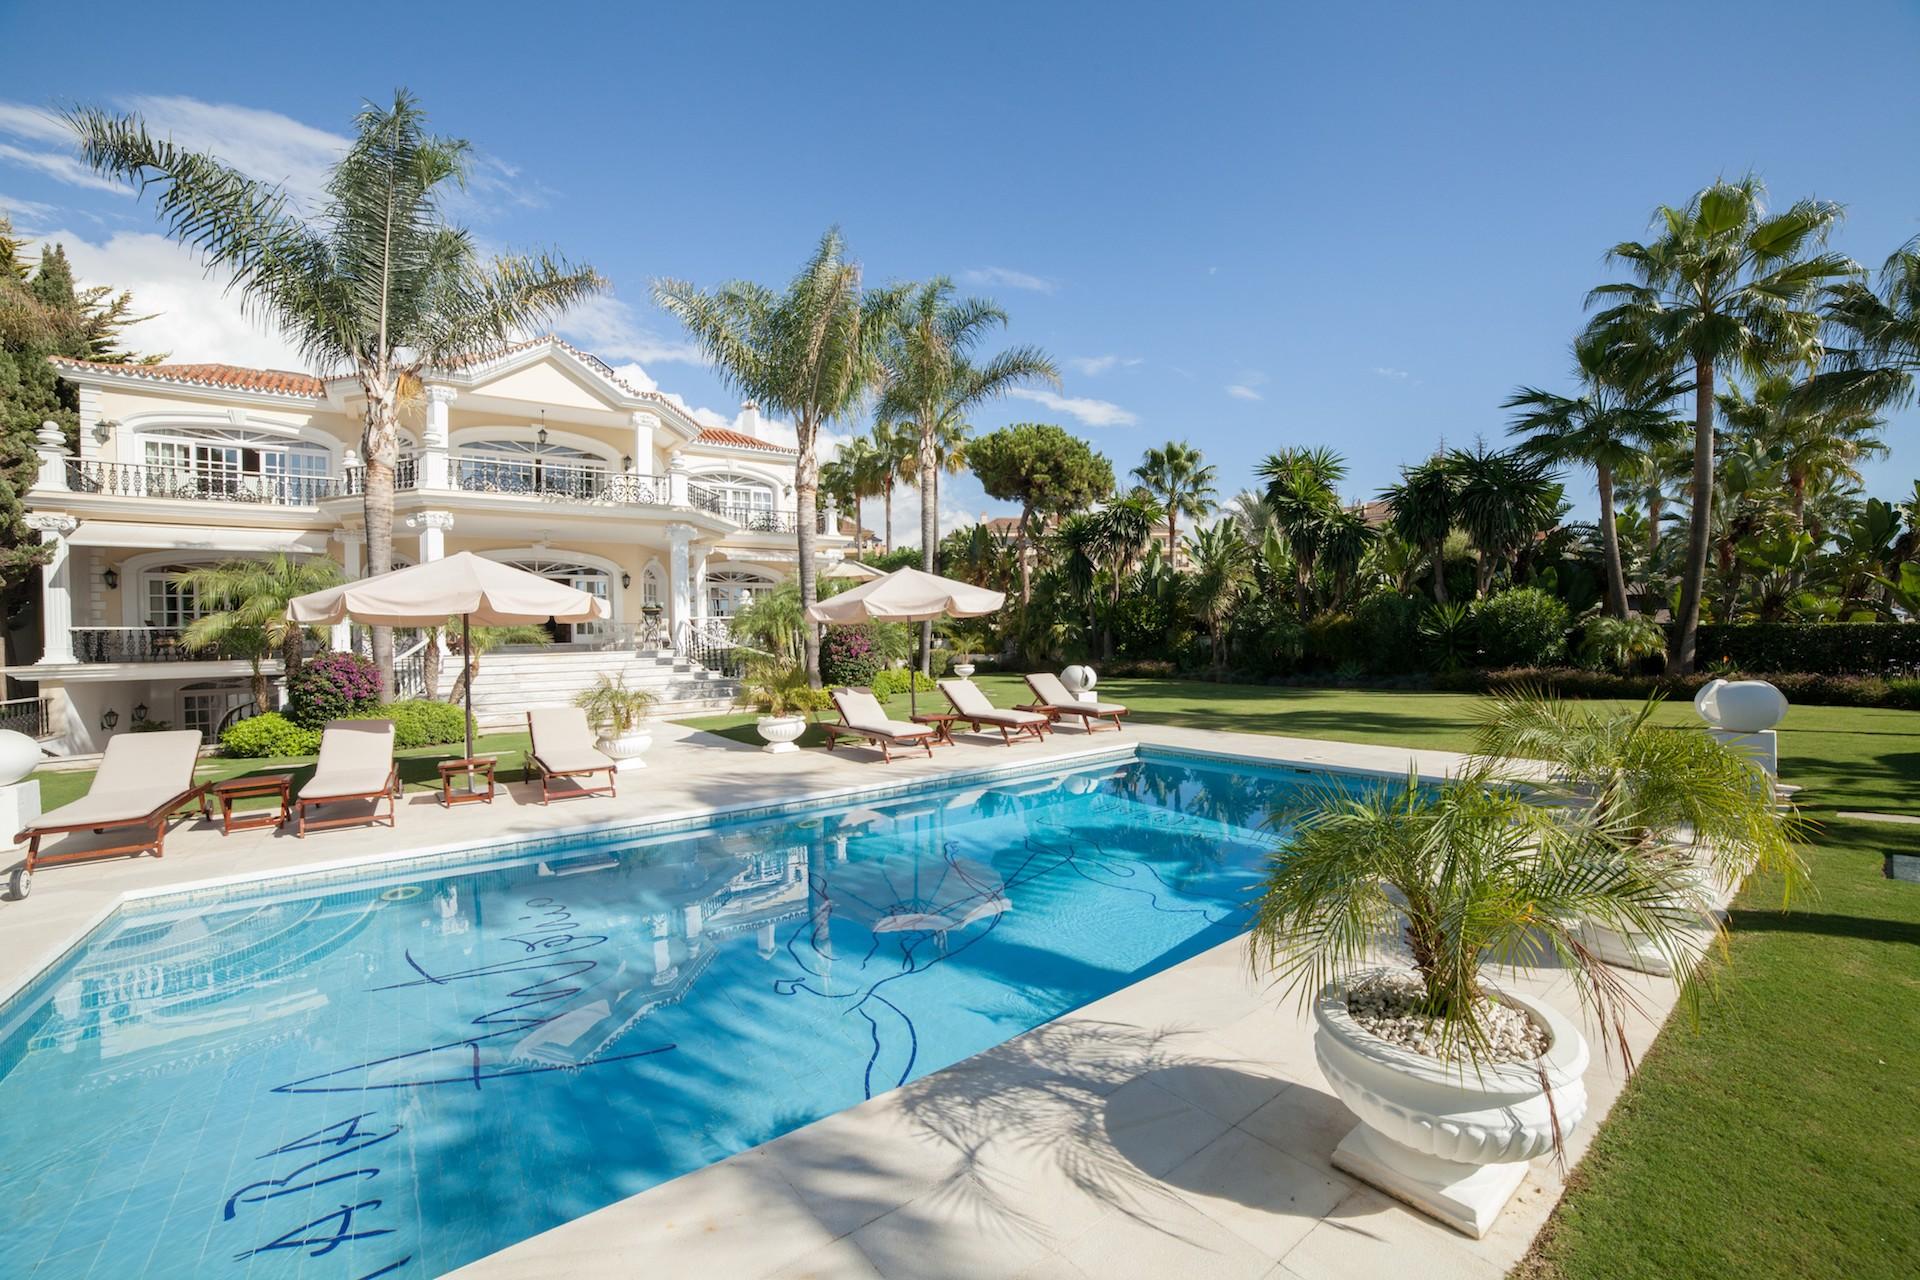 Puerto ban s one of most exclusive addresses in spain - Puerto banus marbella ...